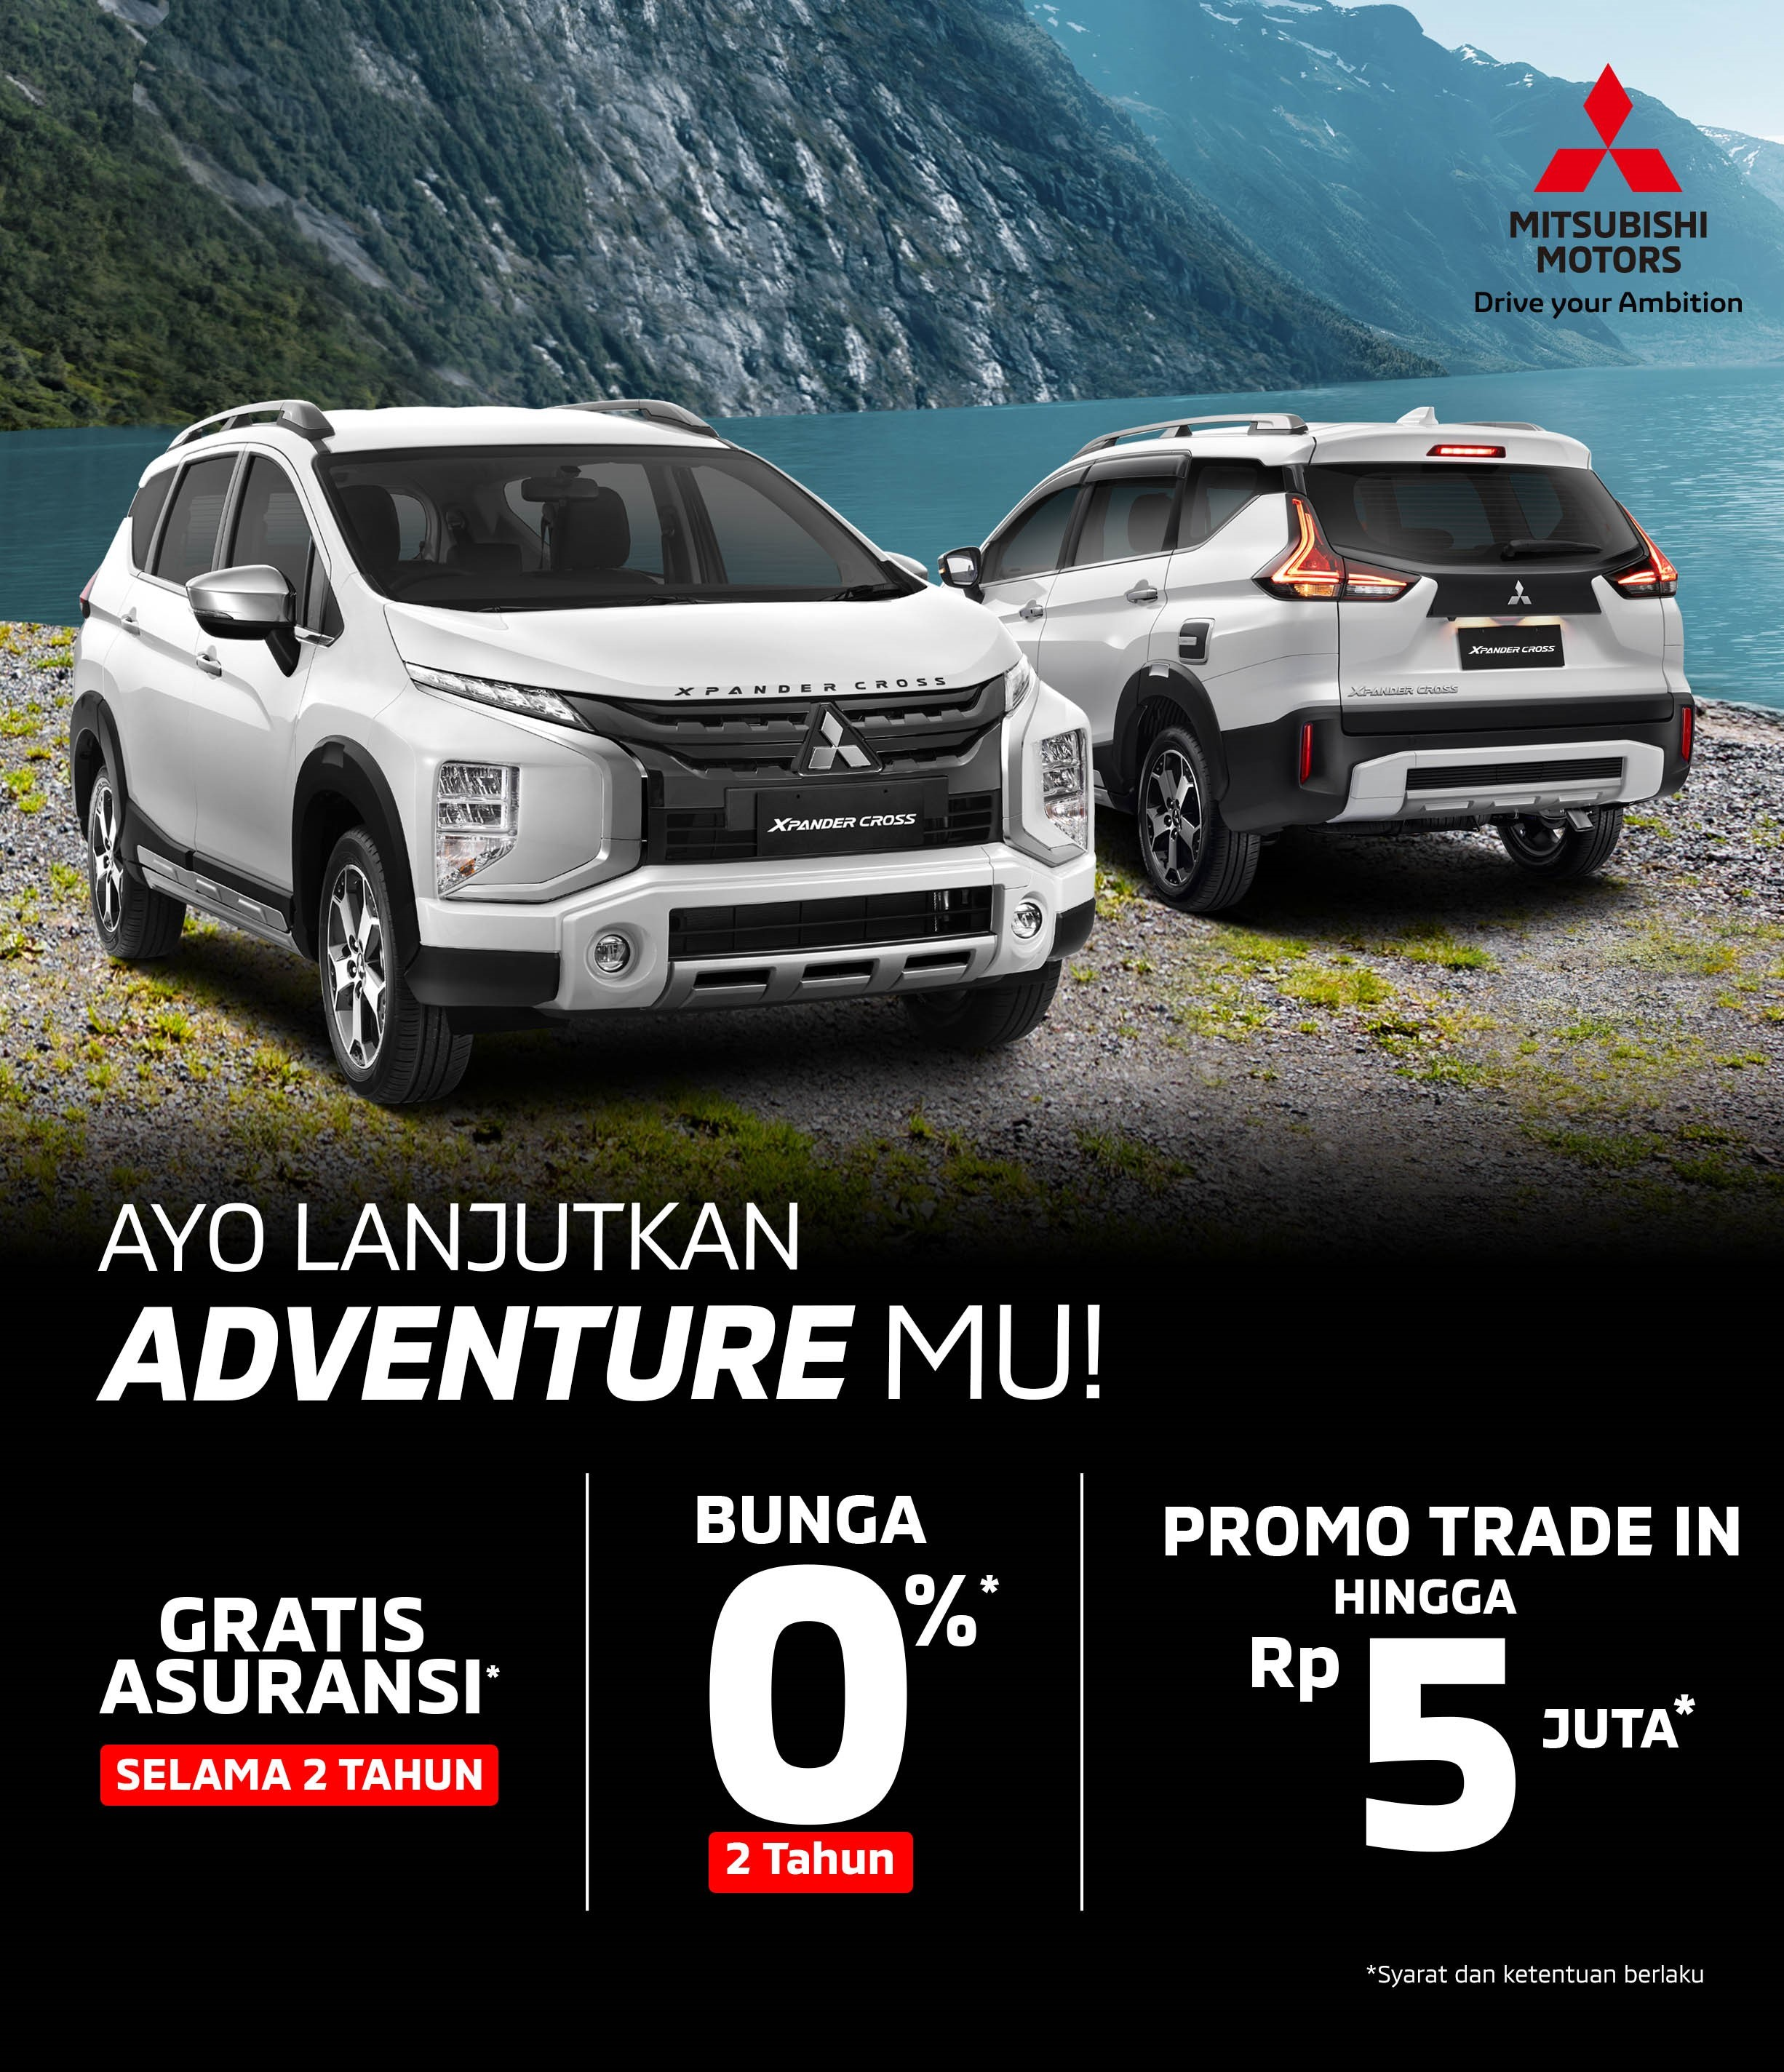 Program Penjualan Mitsubishi Motors Februari 2020